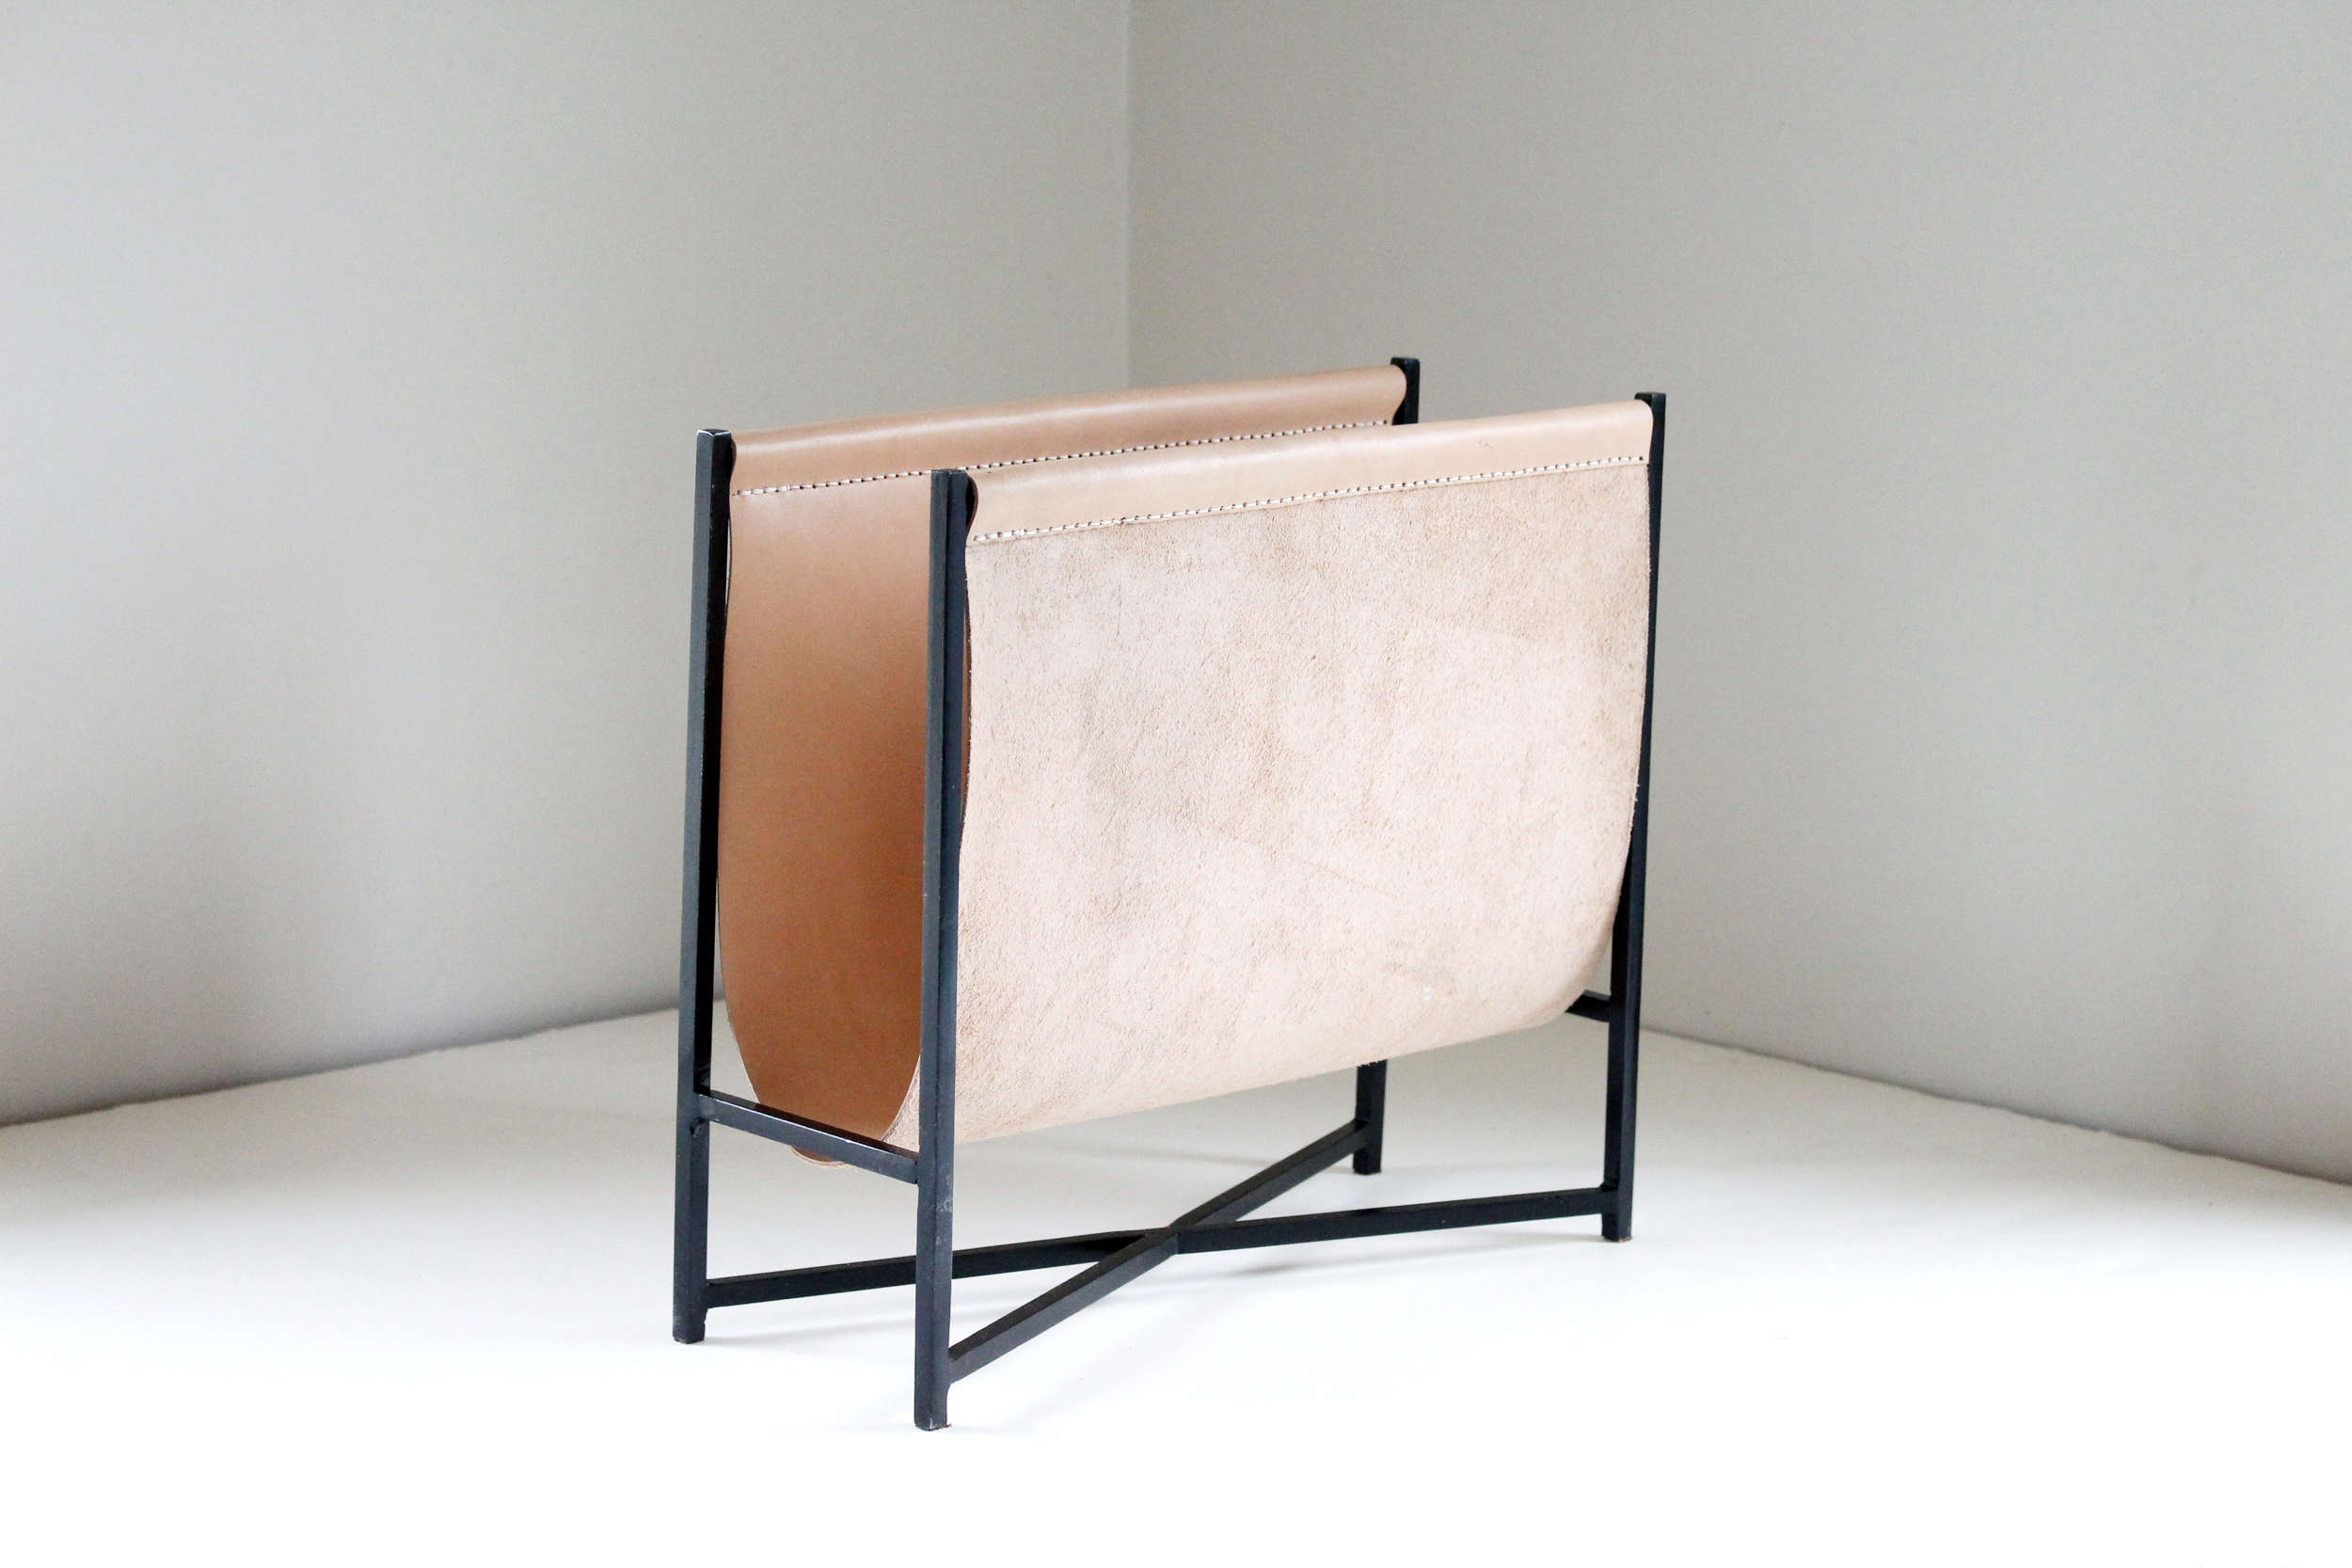 sonia scarr's leather magazine rack 9